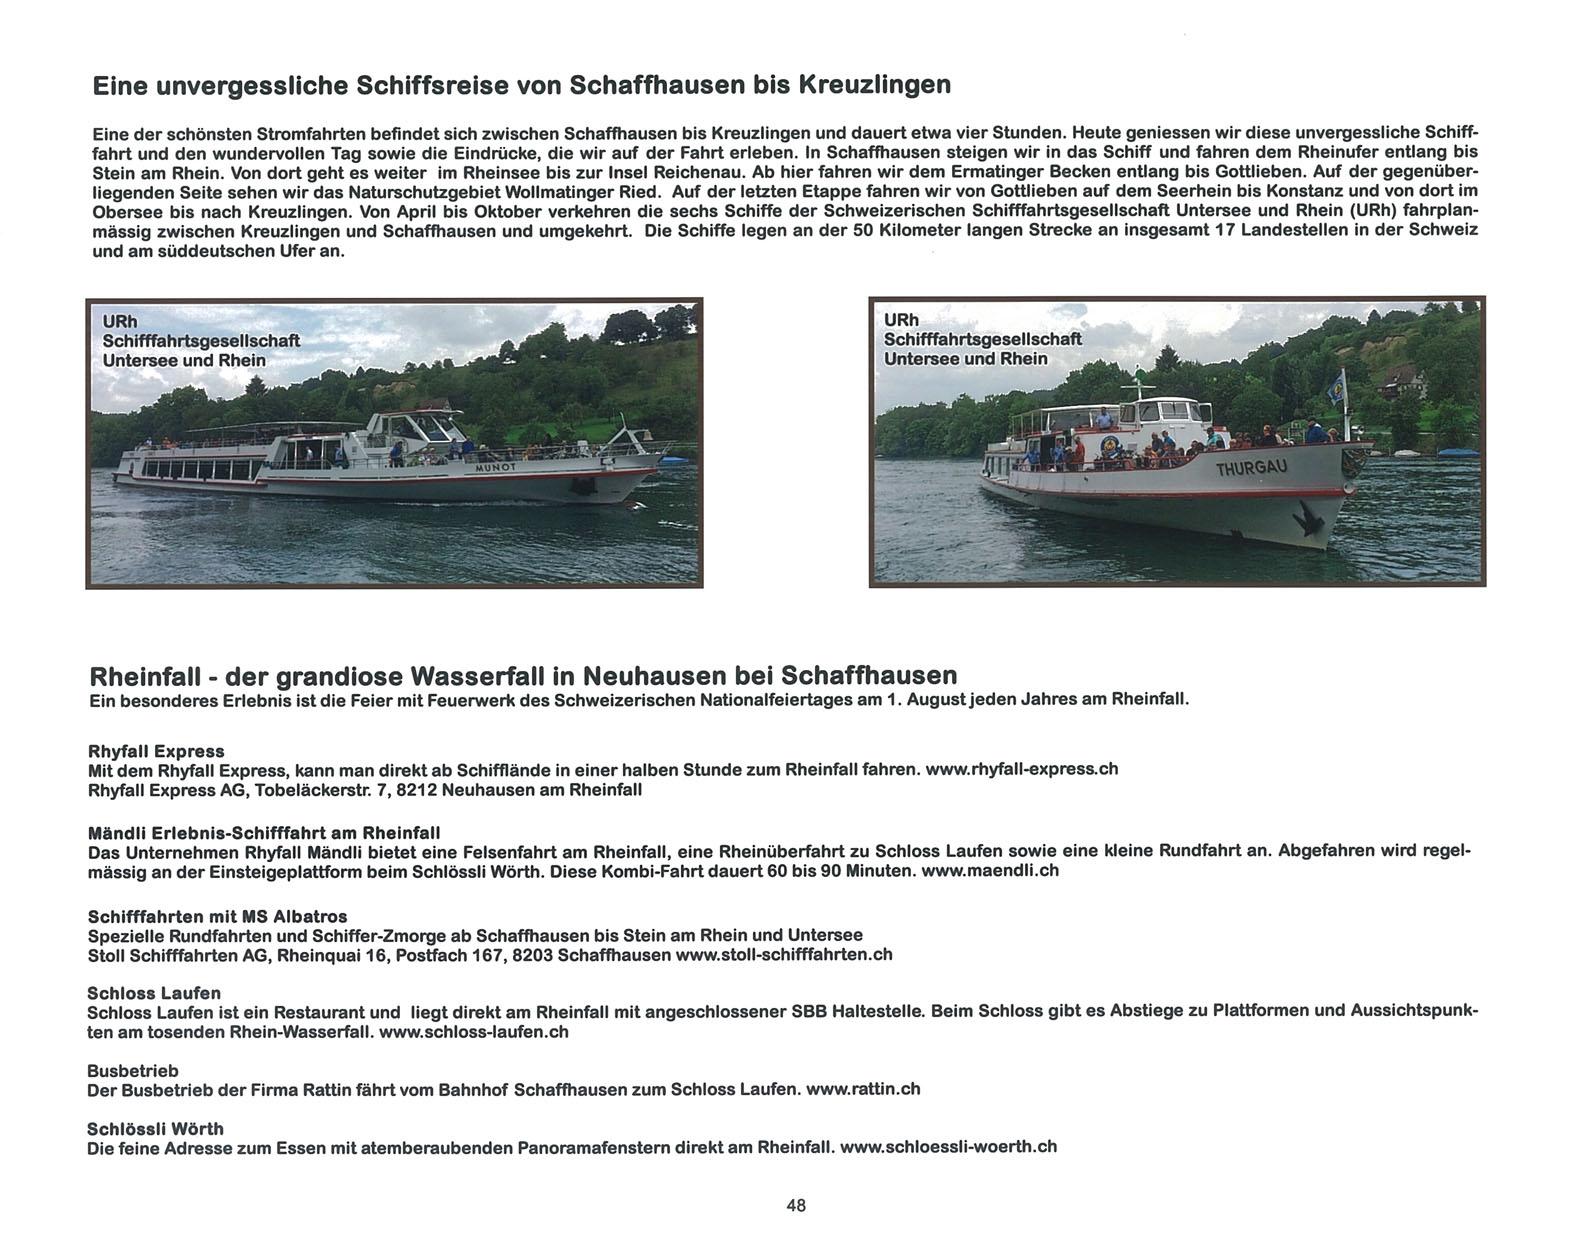 mzbuch2_48